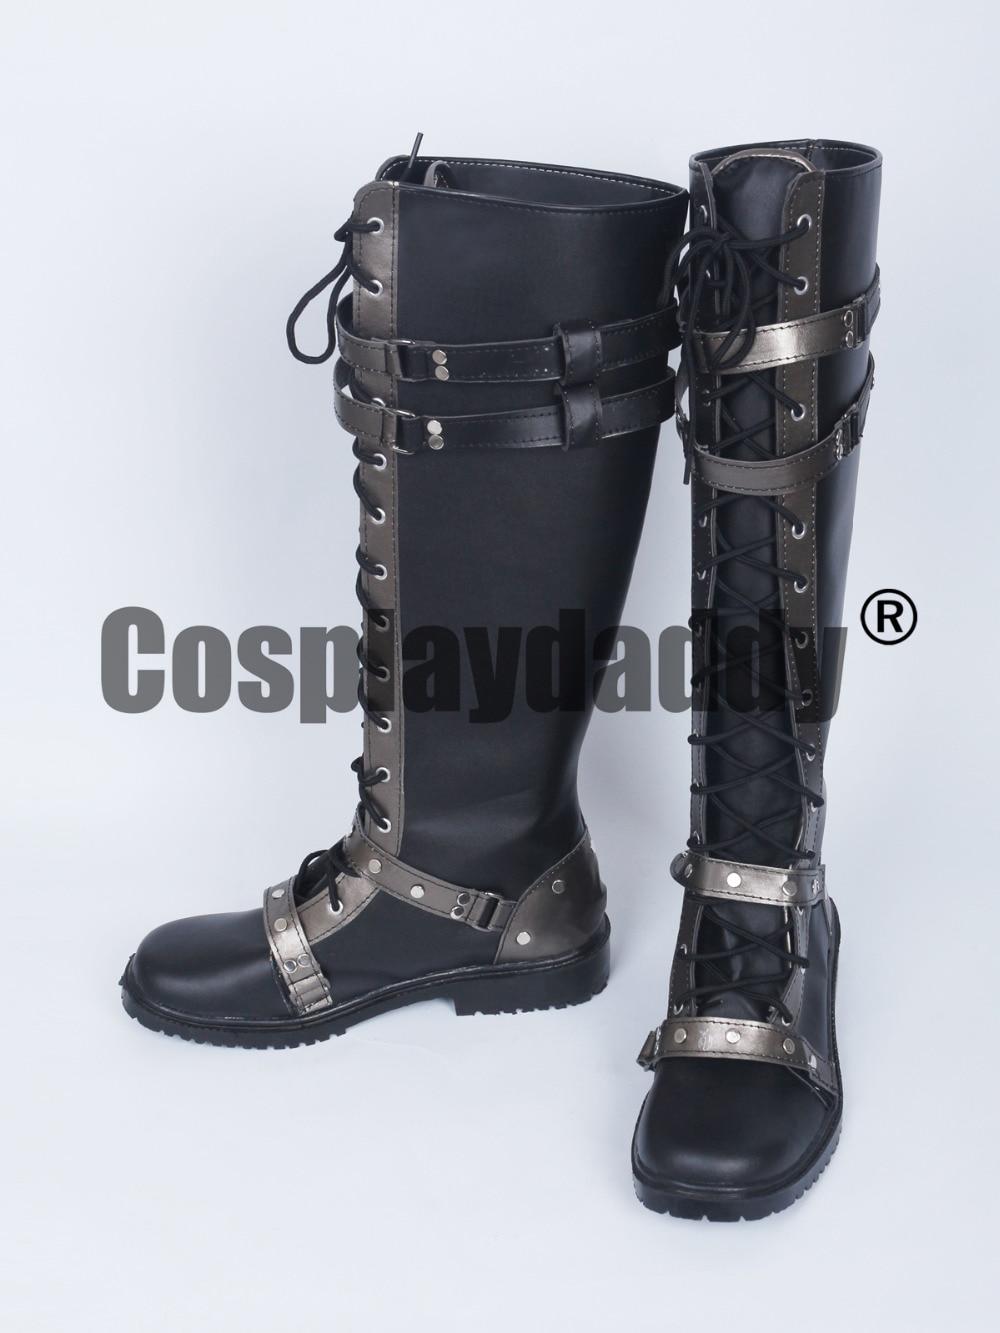 Kingsglaive Final Fantasy XV Nyx Ulric Black Long Cosplay Shoes Boots S008